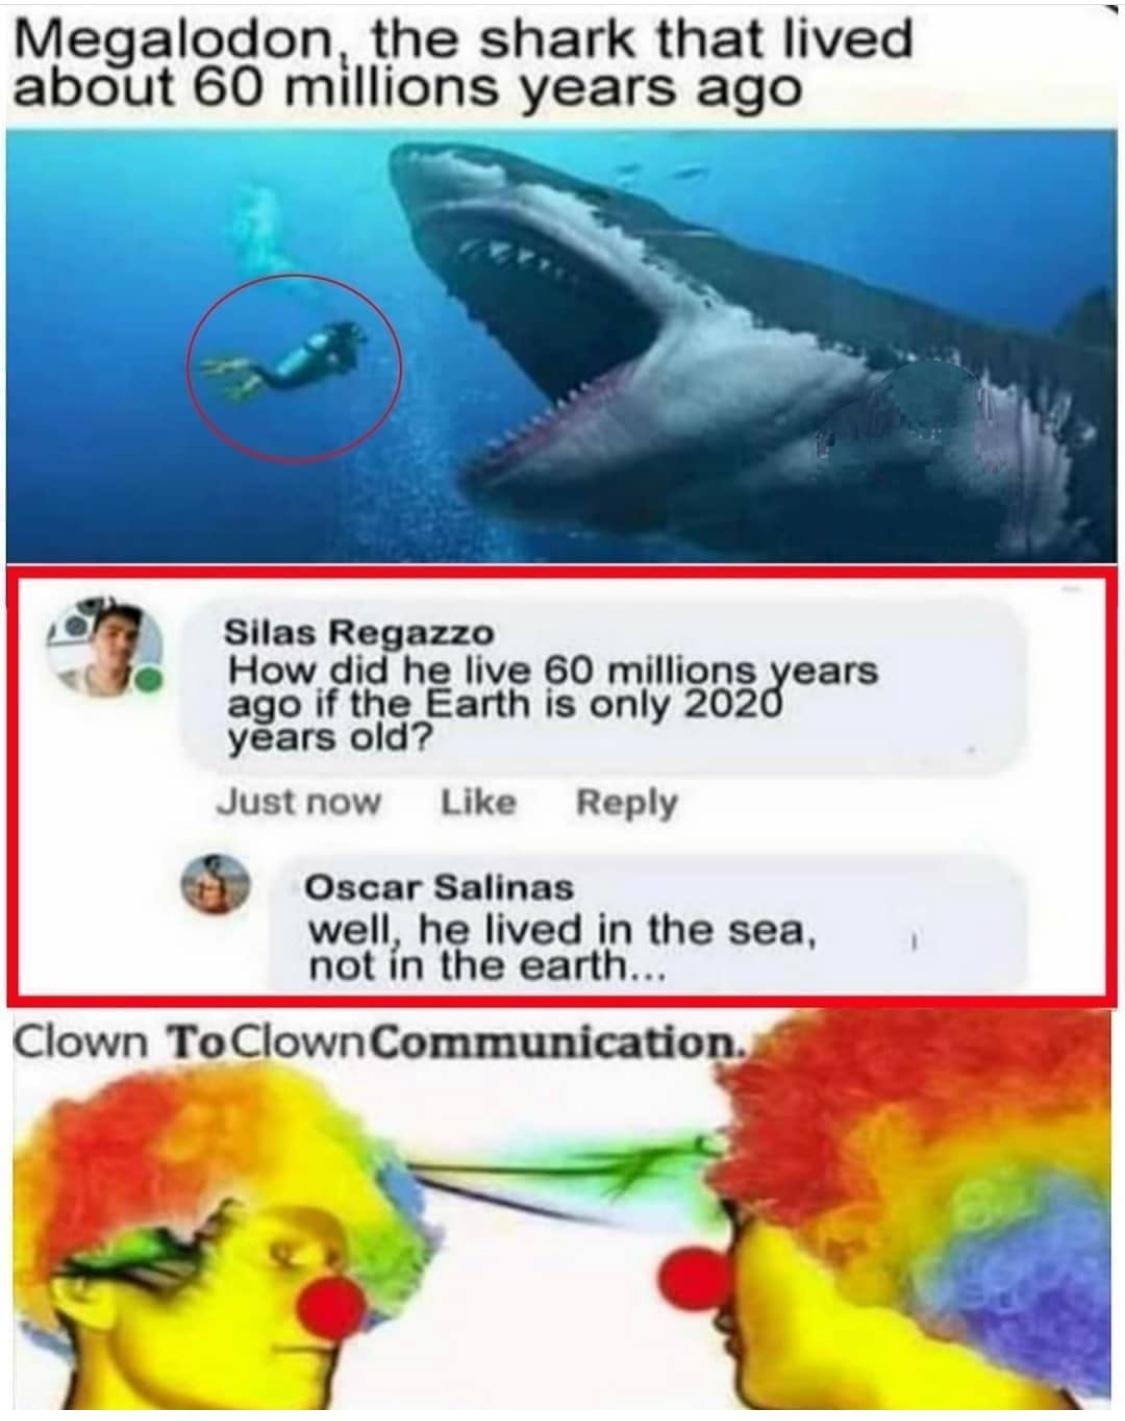 Je sais pas pourquoi j'ai ri - meme